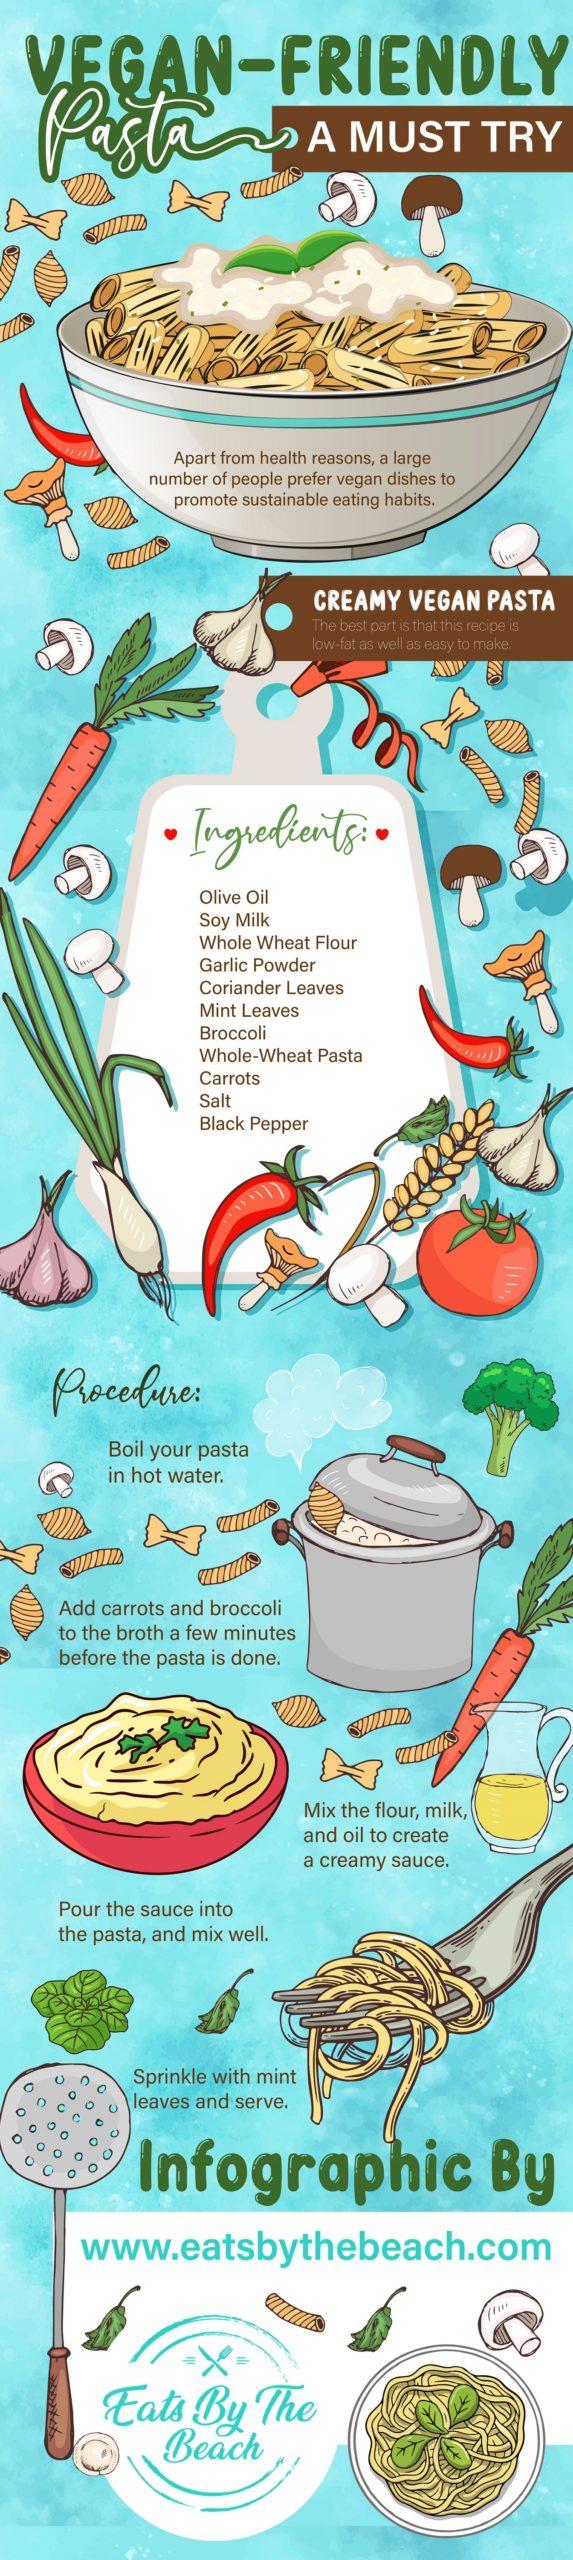 Vegan friend pasta - a must try